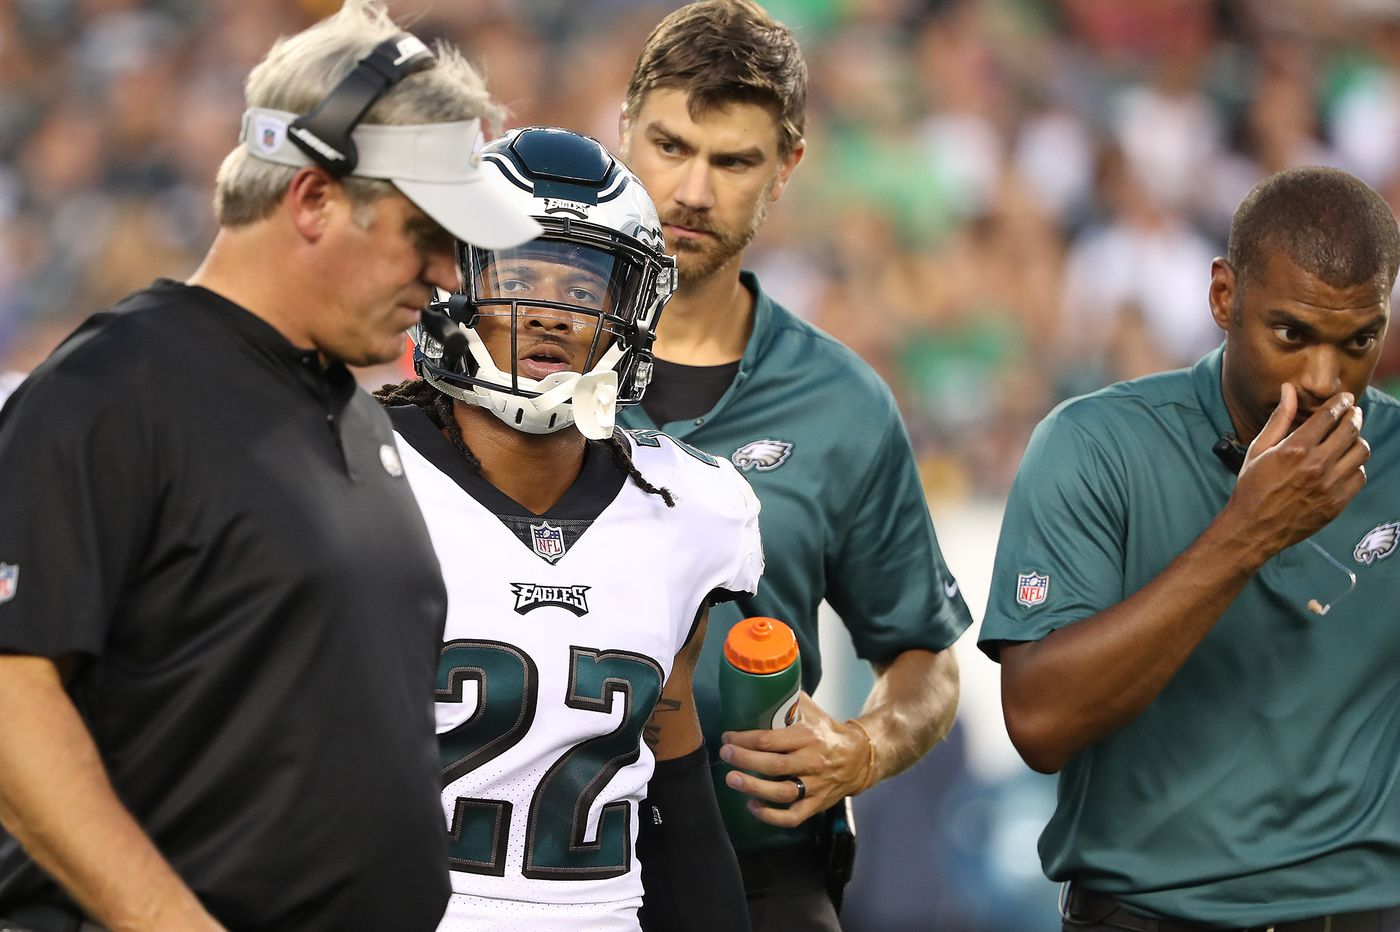 Sidney Jones survives injury scare in Eagles preseason opener